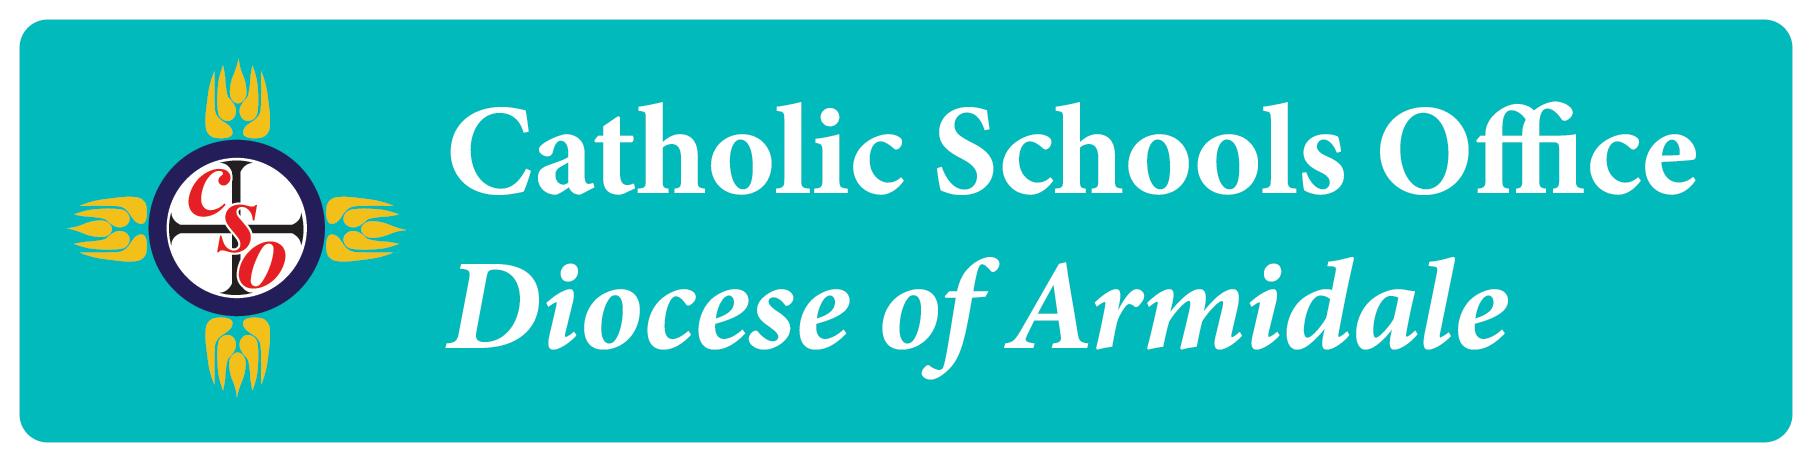 Catholic Schools Office, Diocese of Armidale